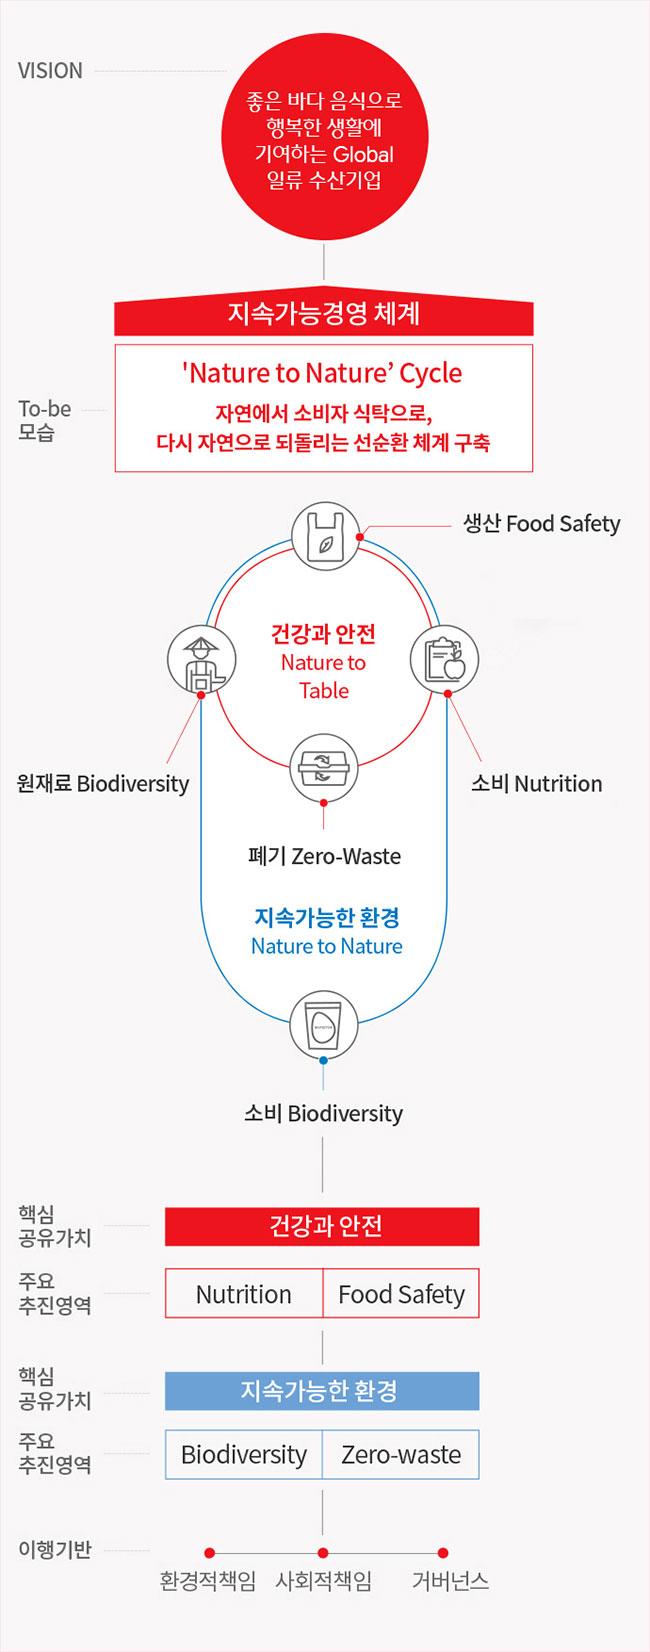 VISION : Global No.1 Food & BIO Company > To-be 모습 : 지속가능경영 체계 - 'Nature to Nature'Cycle 자연에서 소비자 식탁으로, 다시 자연으로 되돌리는 선순환 체계 구축 > 건강과 안전 (Nature to Table) : 생산 Food Safety ( 즐거운동행, 미세먼지, 미세플라스틱, Zero化 ) , 원재료 Biodiversity ( 베트남 농촌개발 사업, Renewable 자원대체사업 ), 소비 Nutrition ( 개인맞춤형 영양증진 사업 ,항생제 대체 소재 ), 폐기 Zero-Waste ( 식품폐기 저감/ Recycling 체계 구축) - 지속 가능한 환경 Nature to Nature > 소비 Biodiversity (화학소재 대체 친환경 바이오 소재, 친환경 사료첨가제 사업, 친환경 바이오 농업 소재 ) > 핵심 공유가치 : 건강과 안전 > 주요 추진영역 : Nutrition & Food Safety > 핵심 공유가치 : 지속가능한 환경 > 주요 추진영역 : Biodiversity & Zero-waste > 이행 기반 : 환경적책임, 사회적책임, 거버넌스